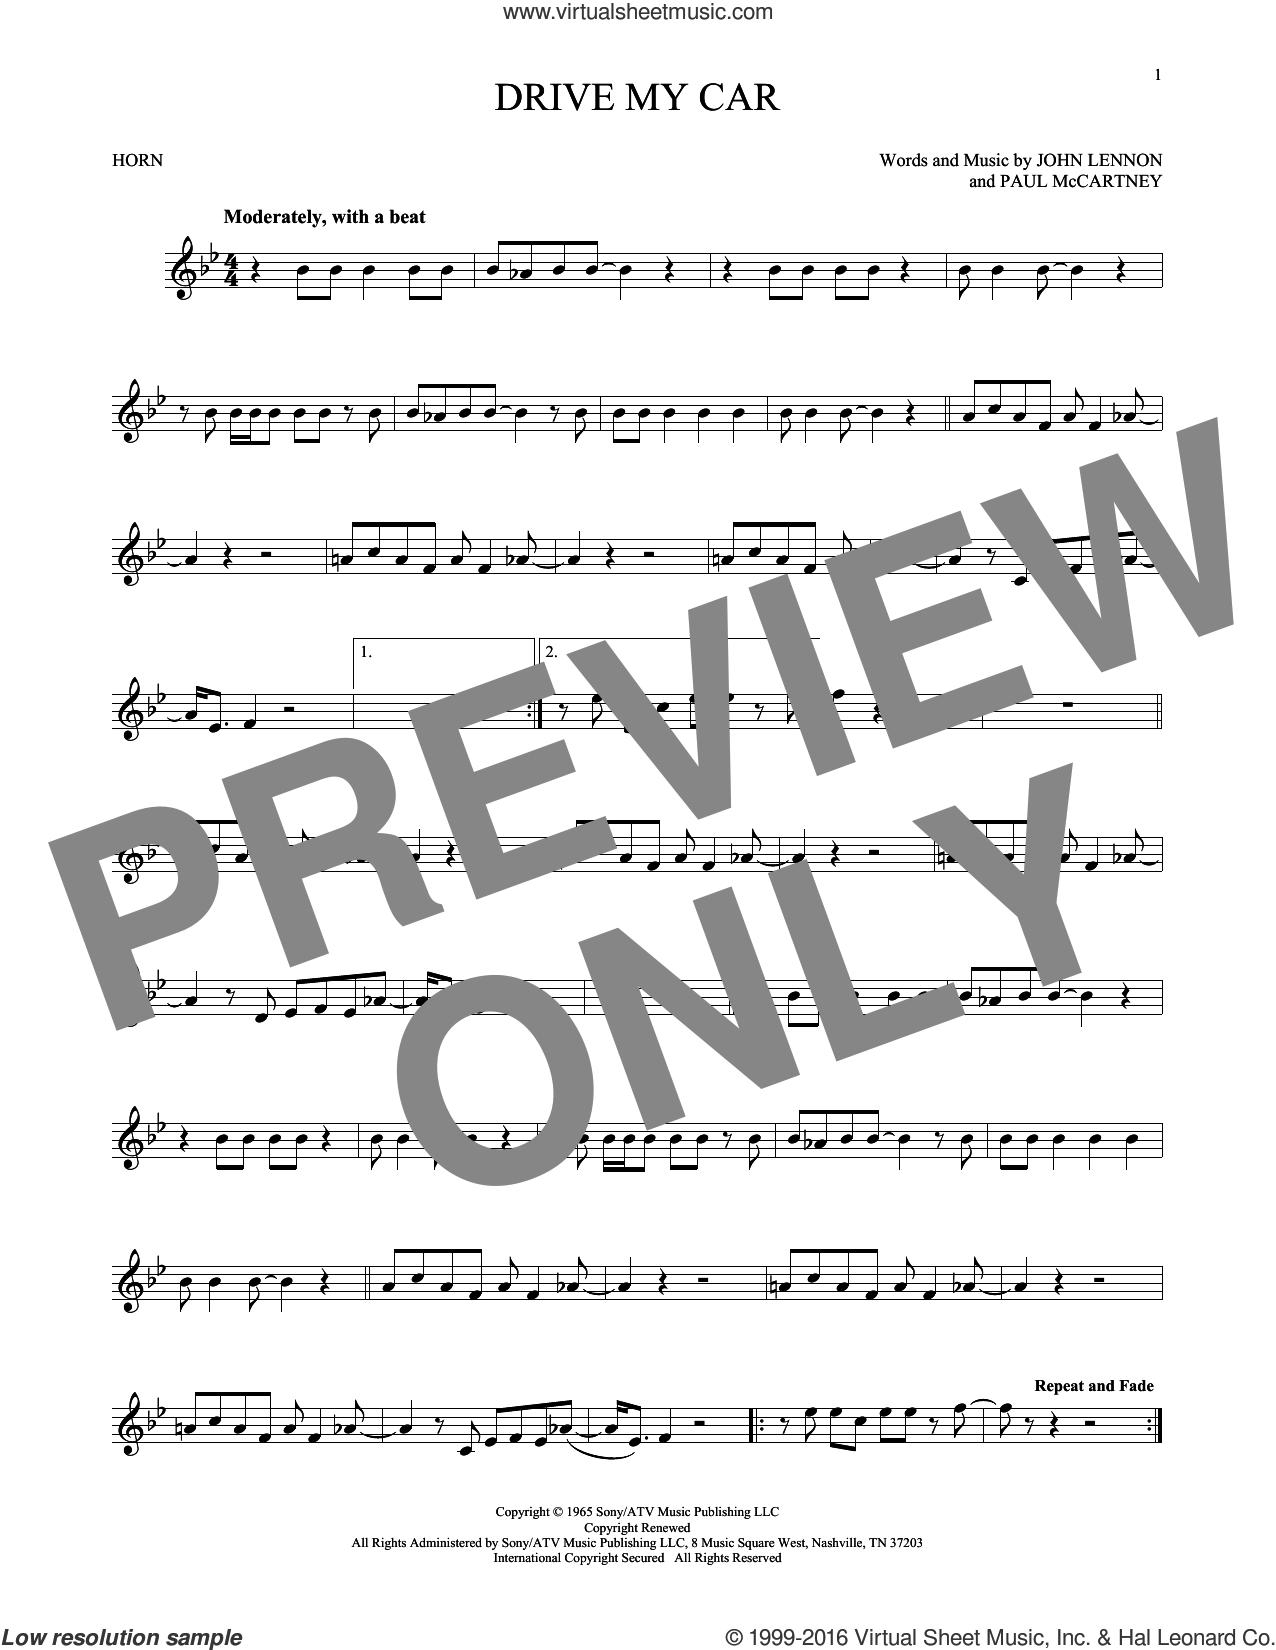 Drive My Car sheet music for horn solo by The Beatles, John Lennon and Paul McCartney, intermediate skill level